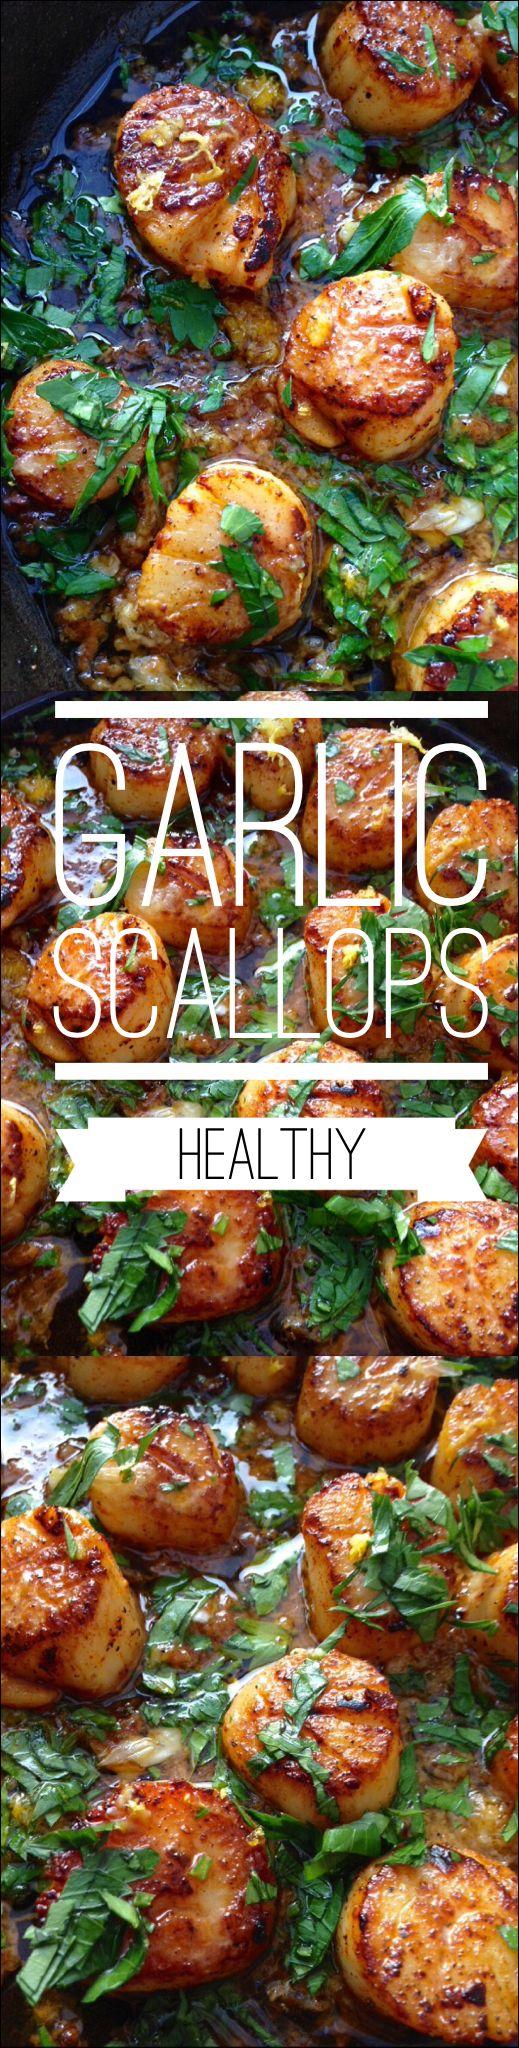 Garlic Scallops ( Healthy ) easy, cooked in Ghee | CiaoFlorentina.com